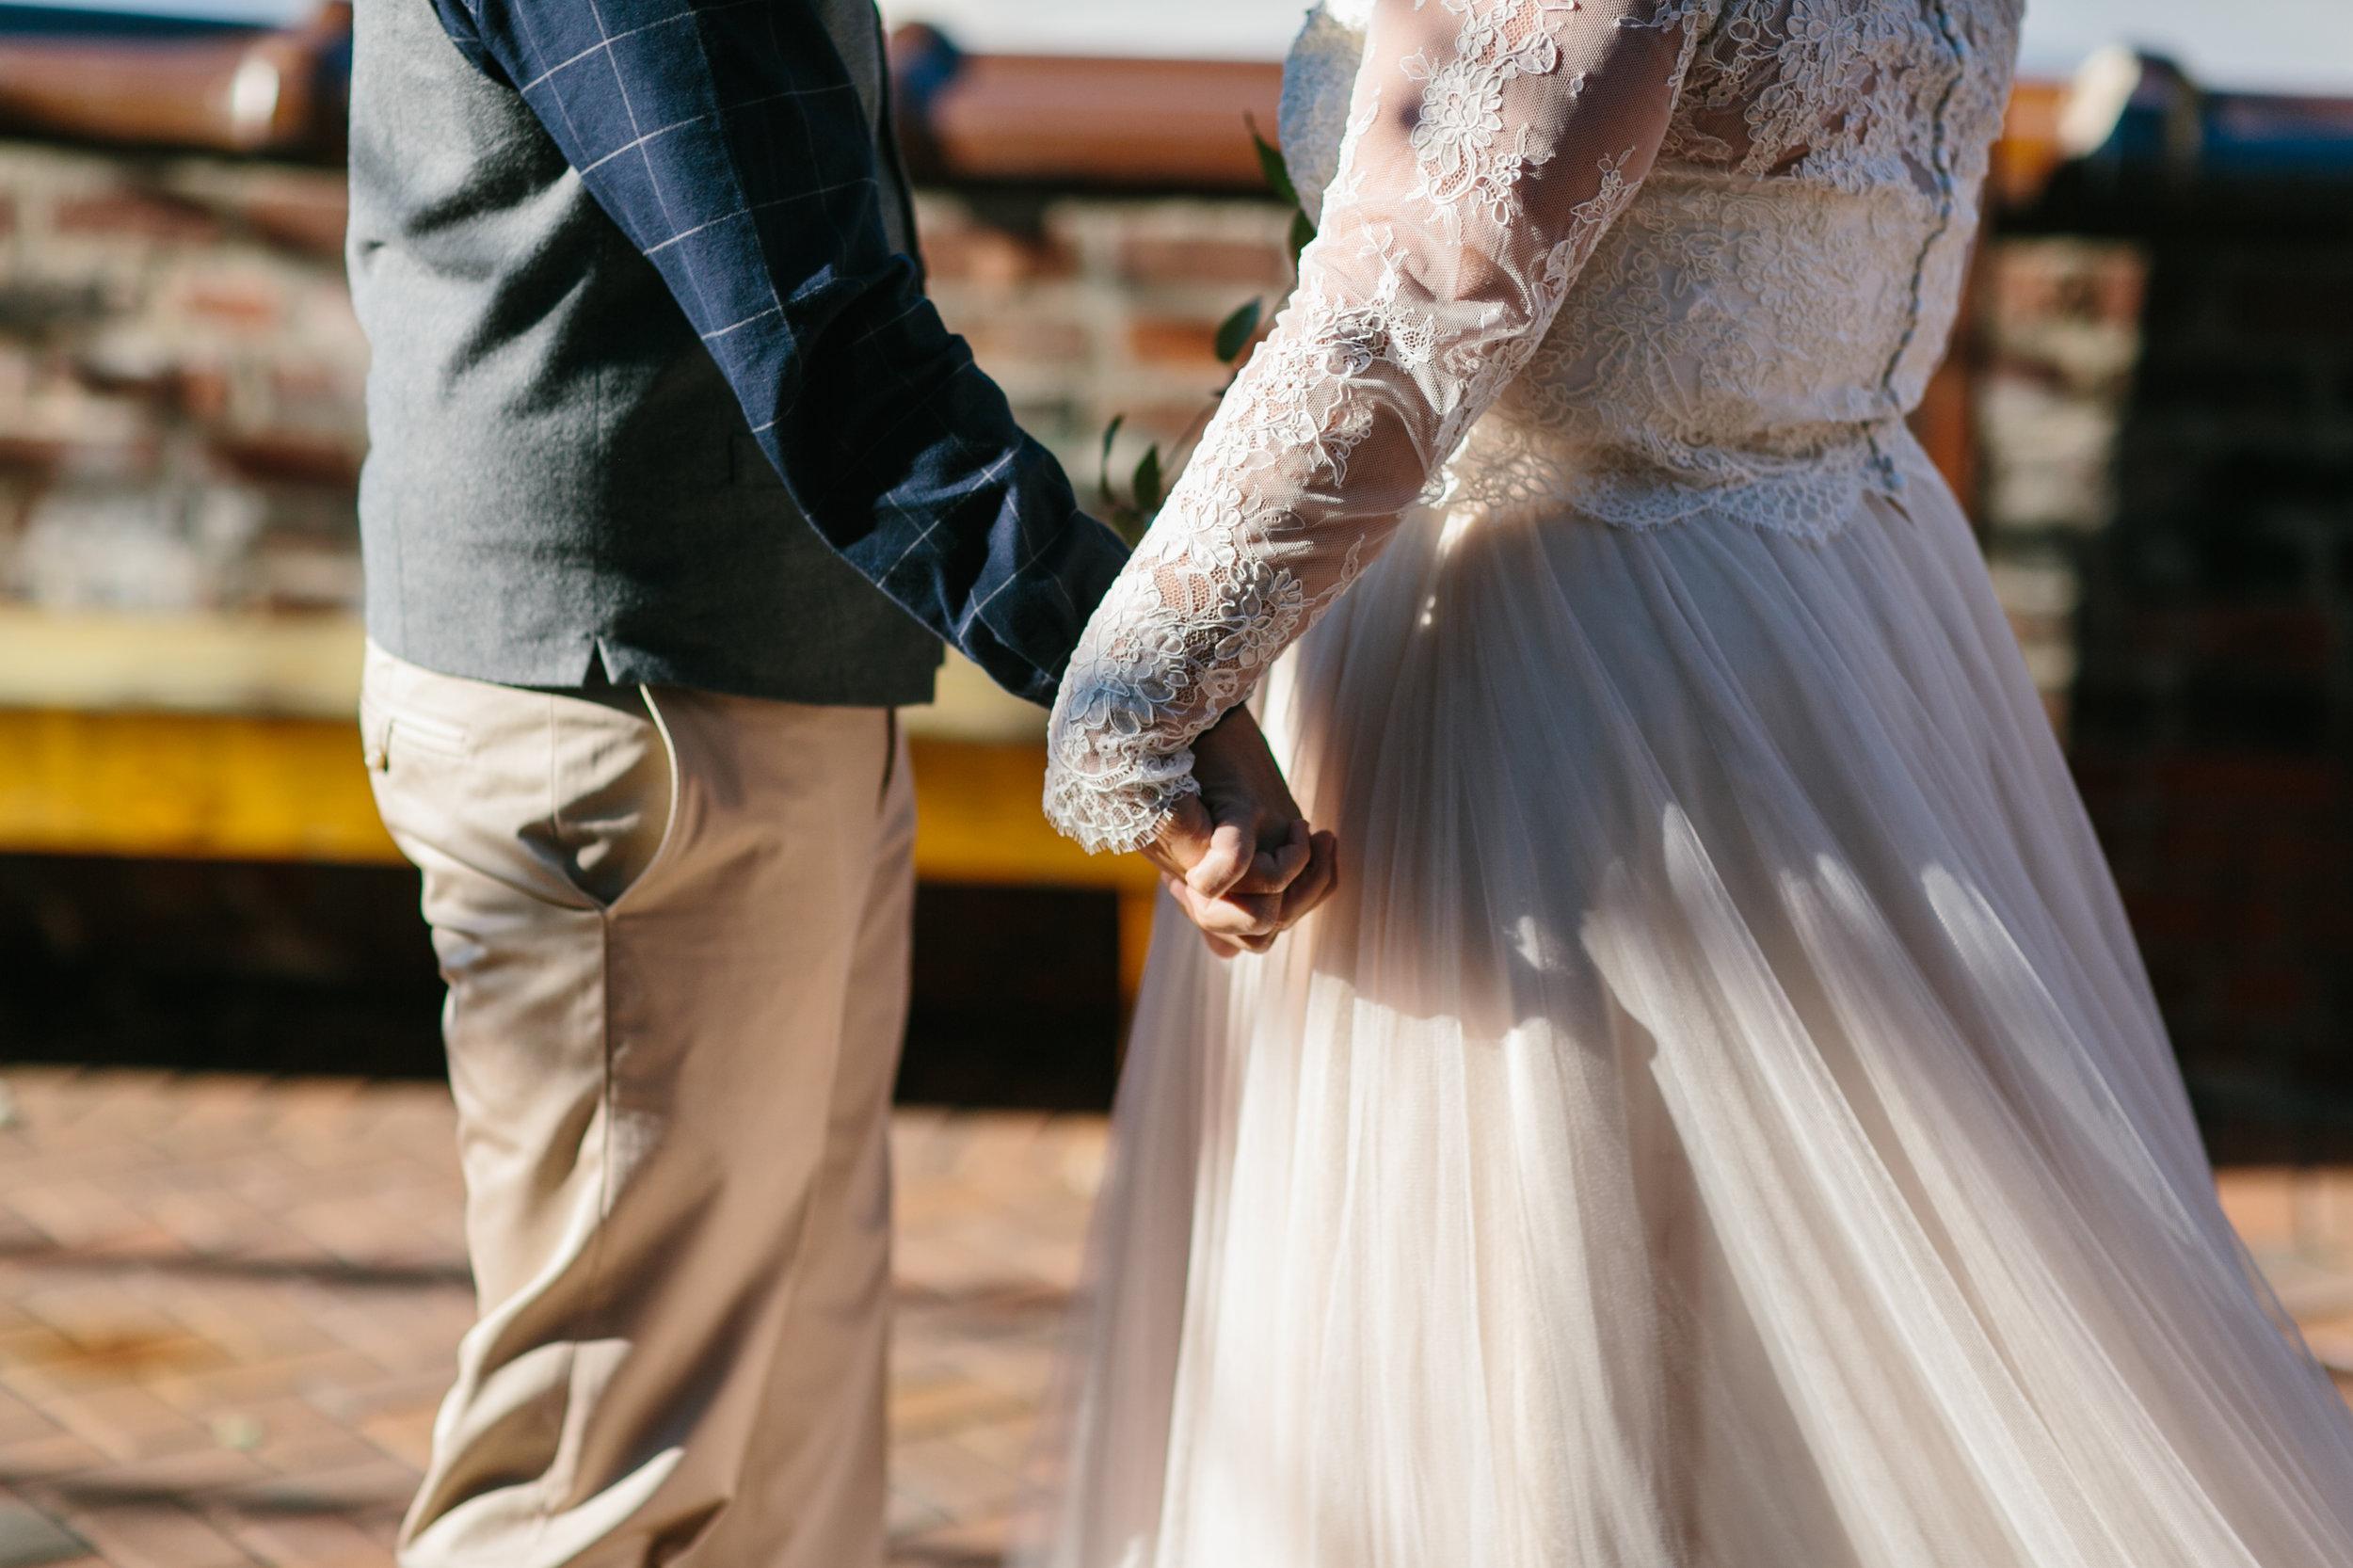 Lauren_Jeremy_Standard_Wedding_Knoxville_Abigail_Malone_Photography_FIlm-176.jpg